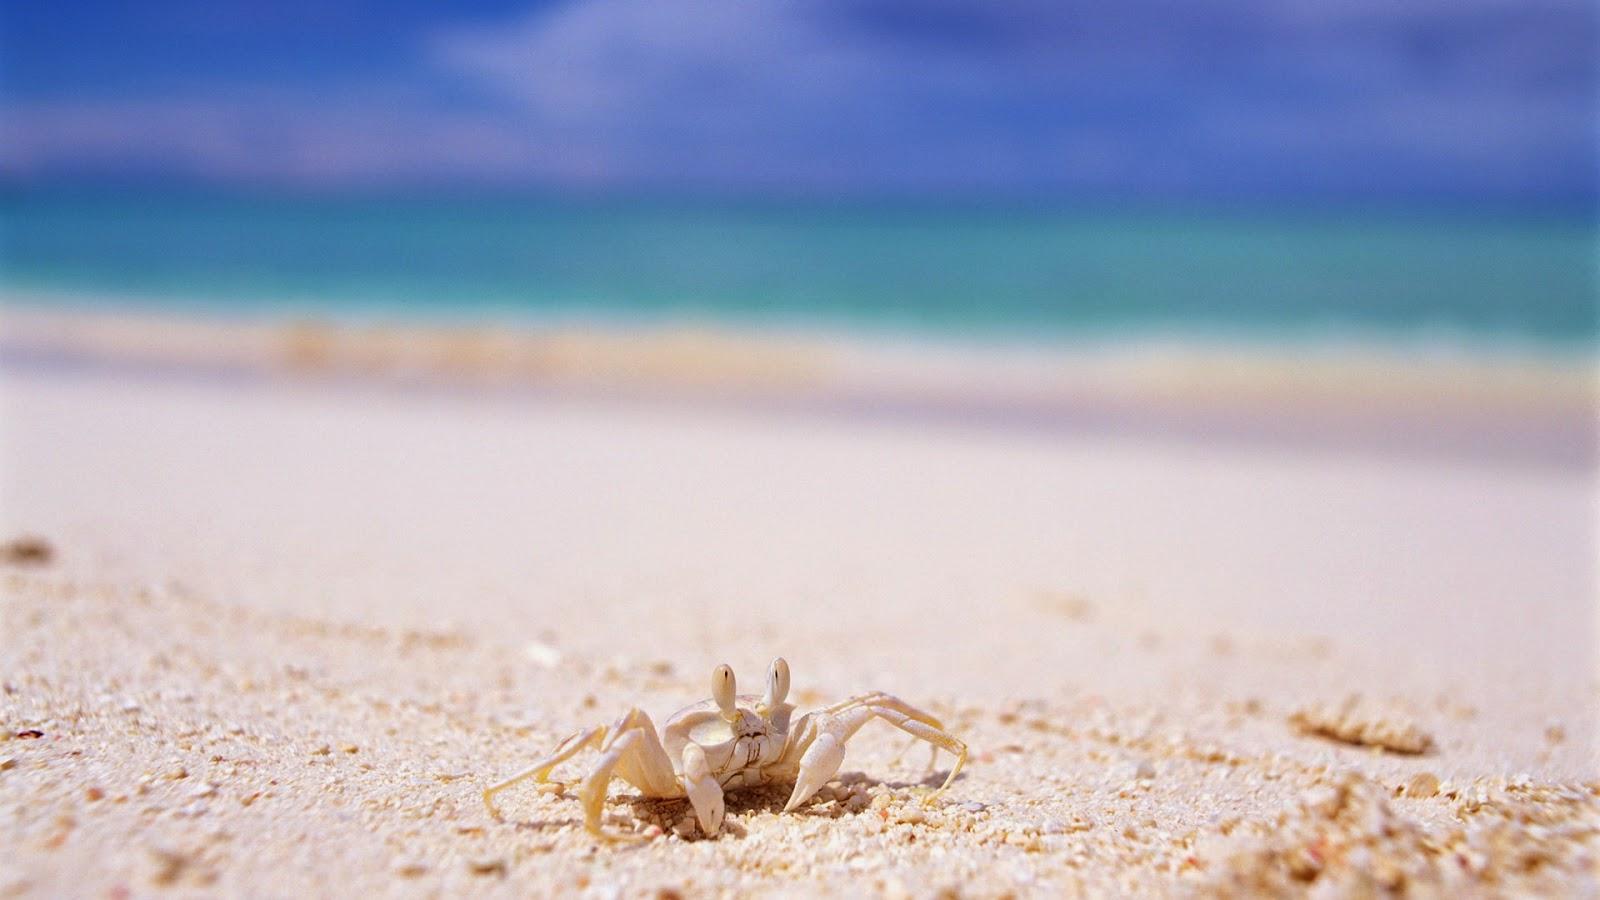 crab-on-white-sand-beach-close-photo-shot.jpg